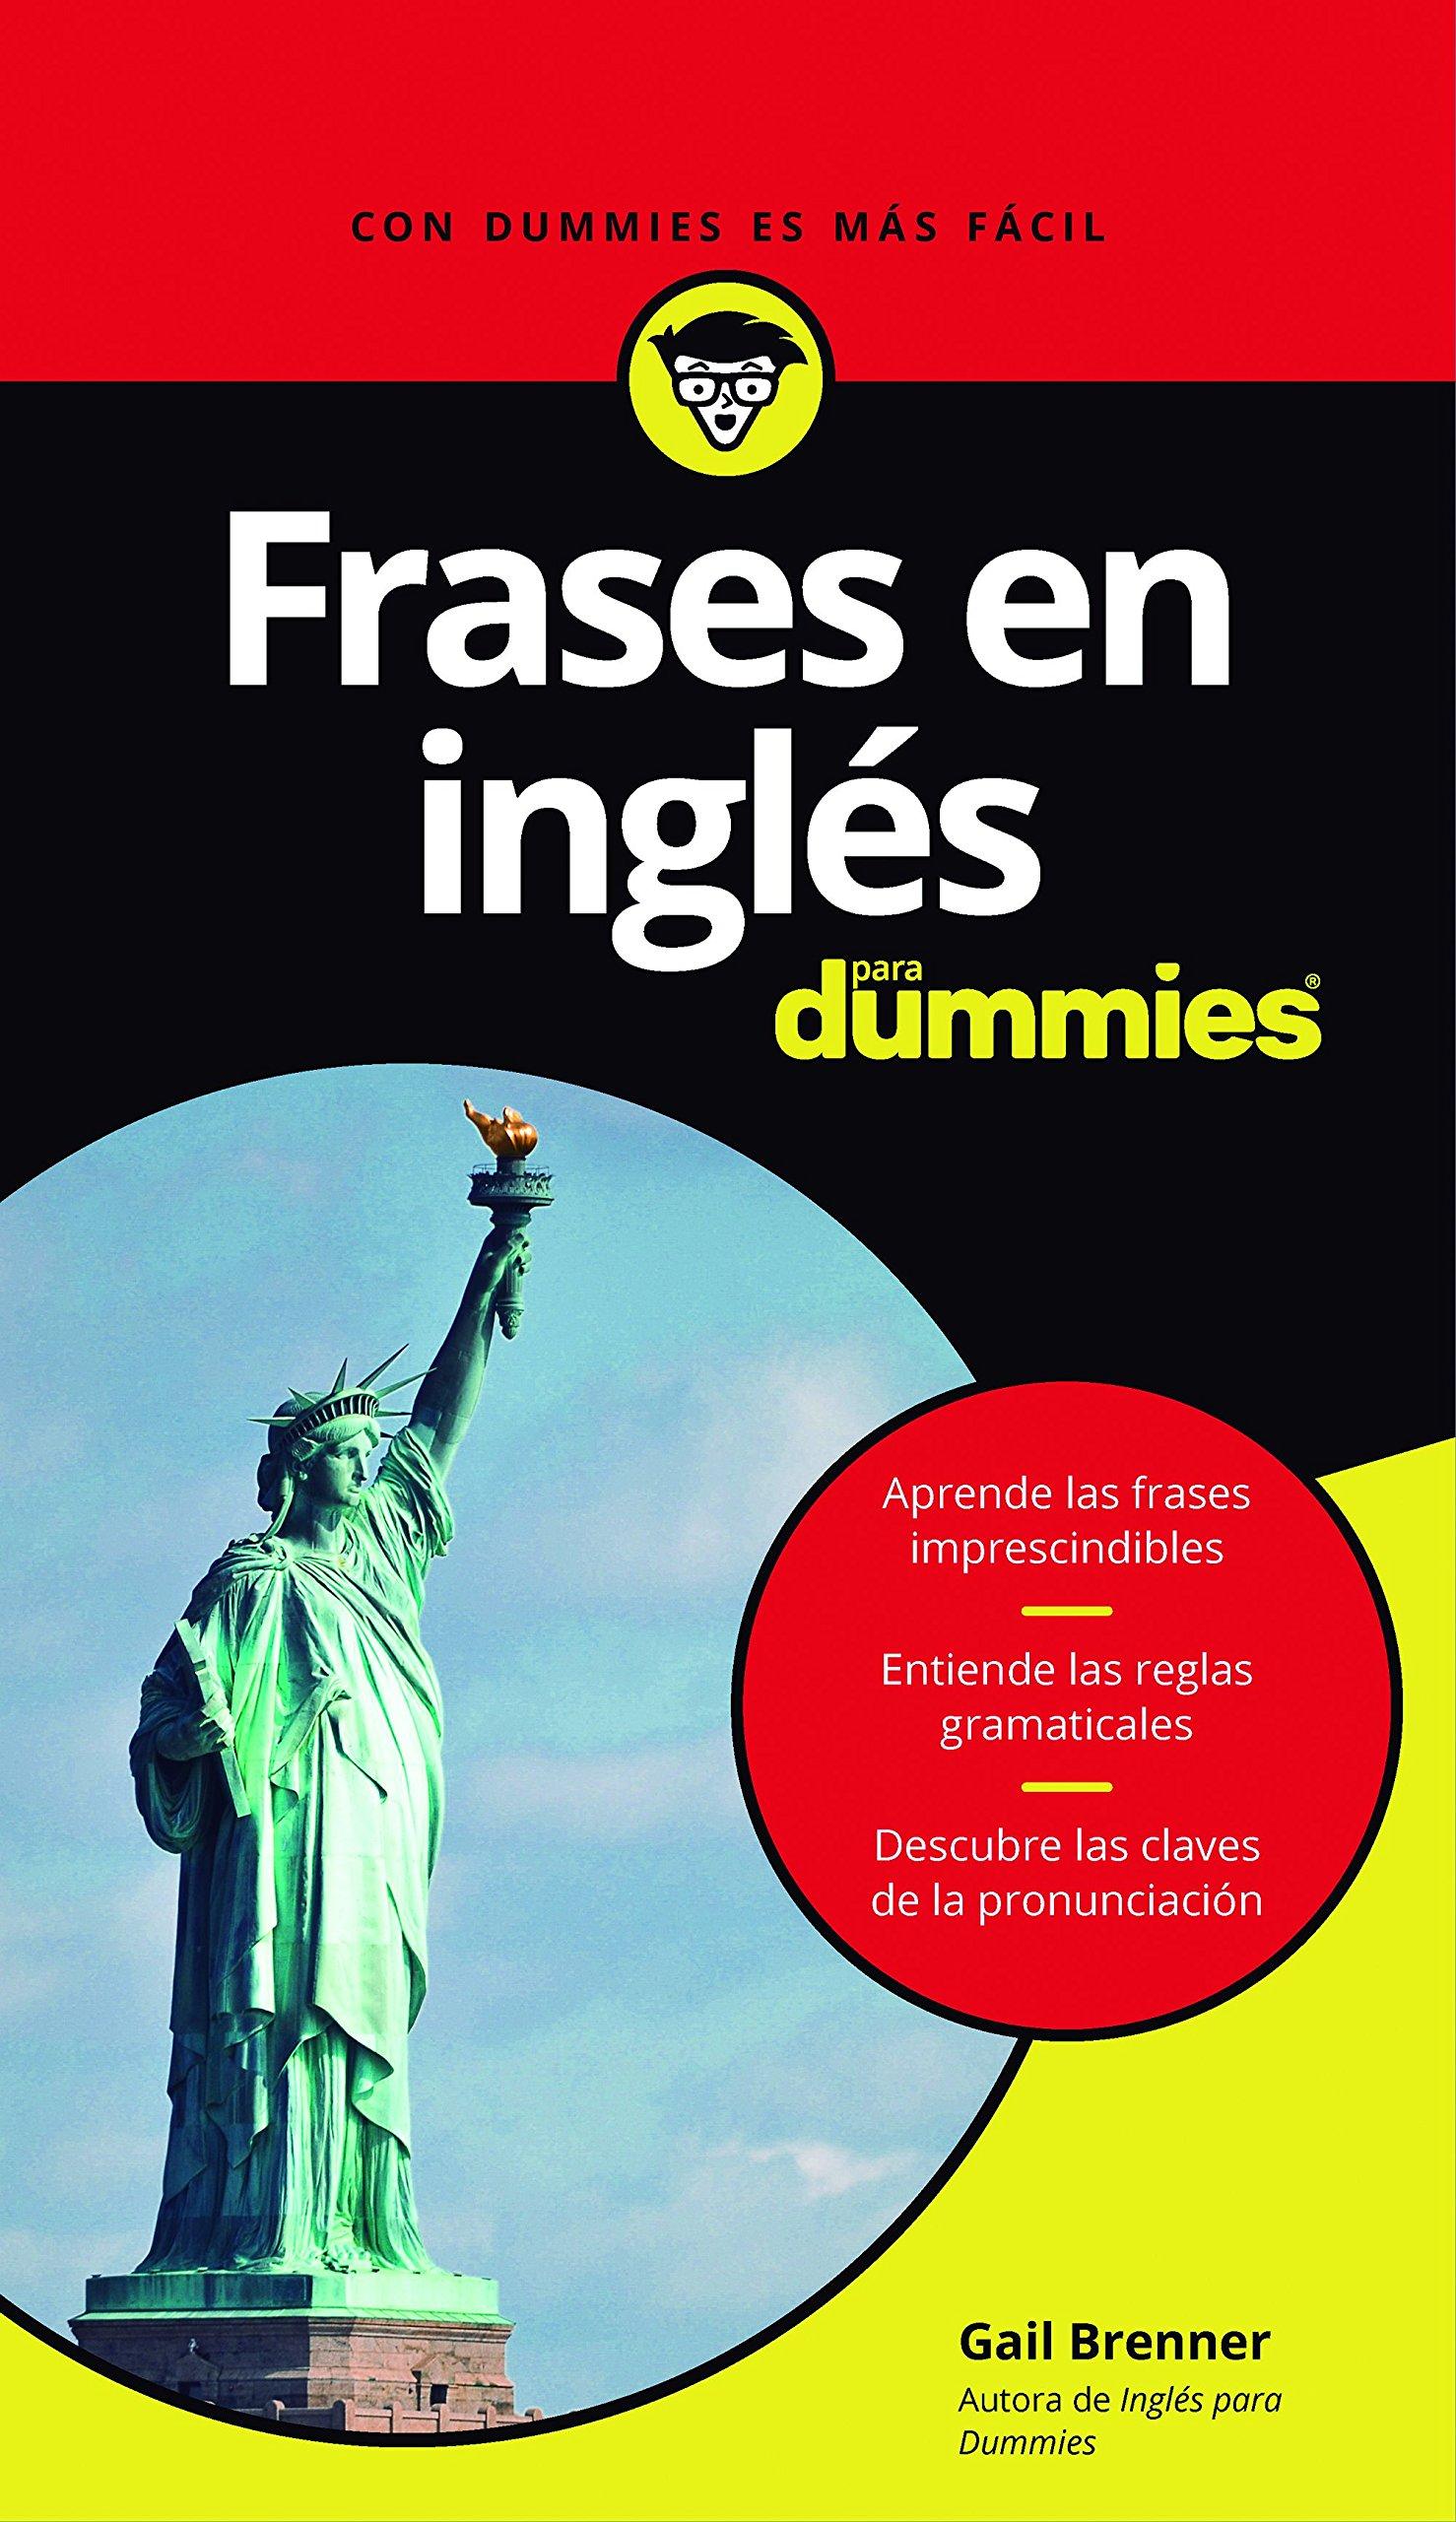 Frases en inglés para Dummies Tapa blanda – 31 ene 2017 Gail Brenner Parramón Ediciones S. A. 8432903337 Usage & grammar guides